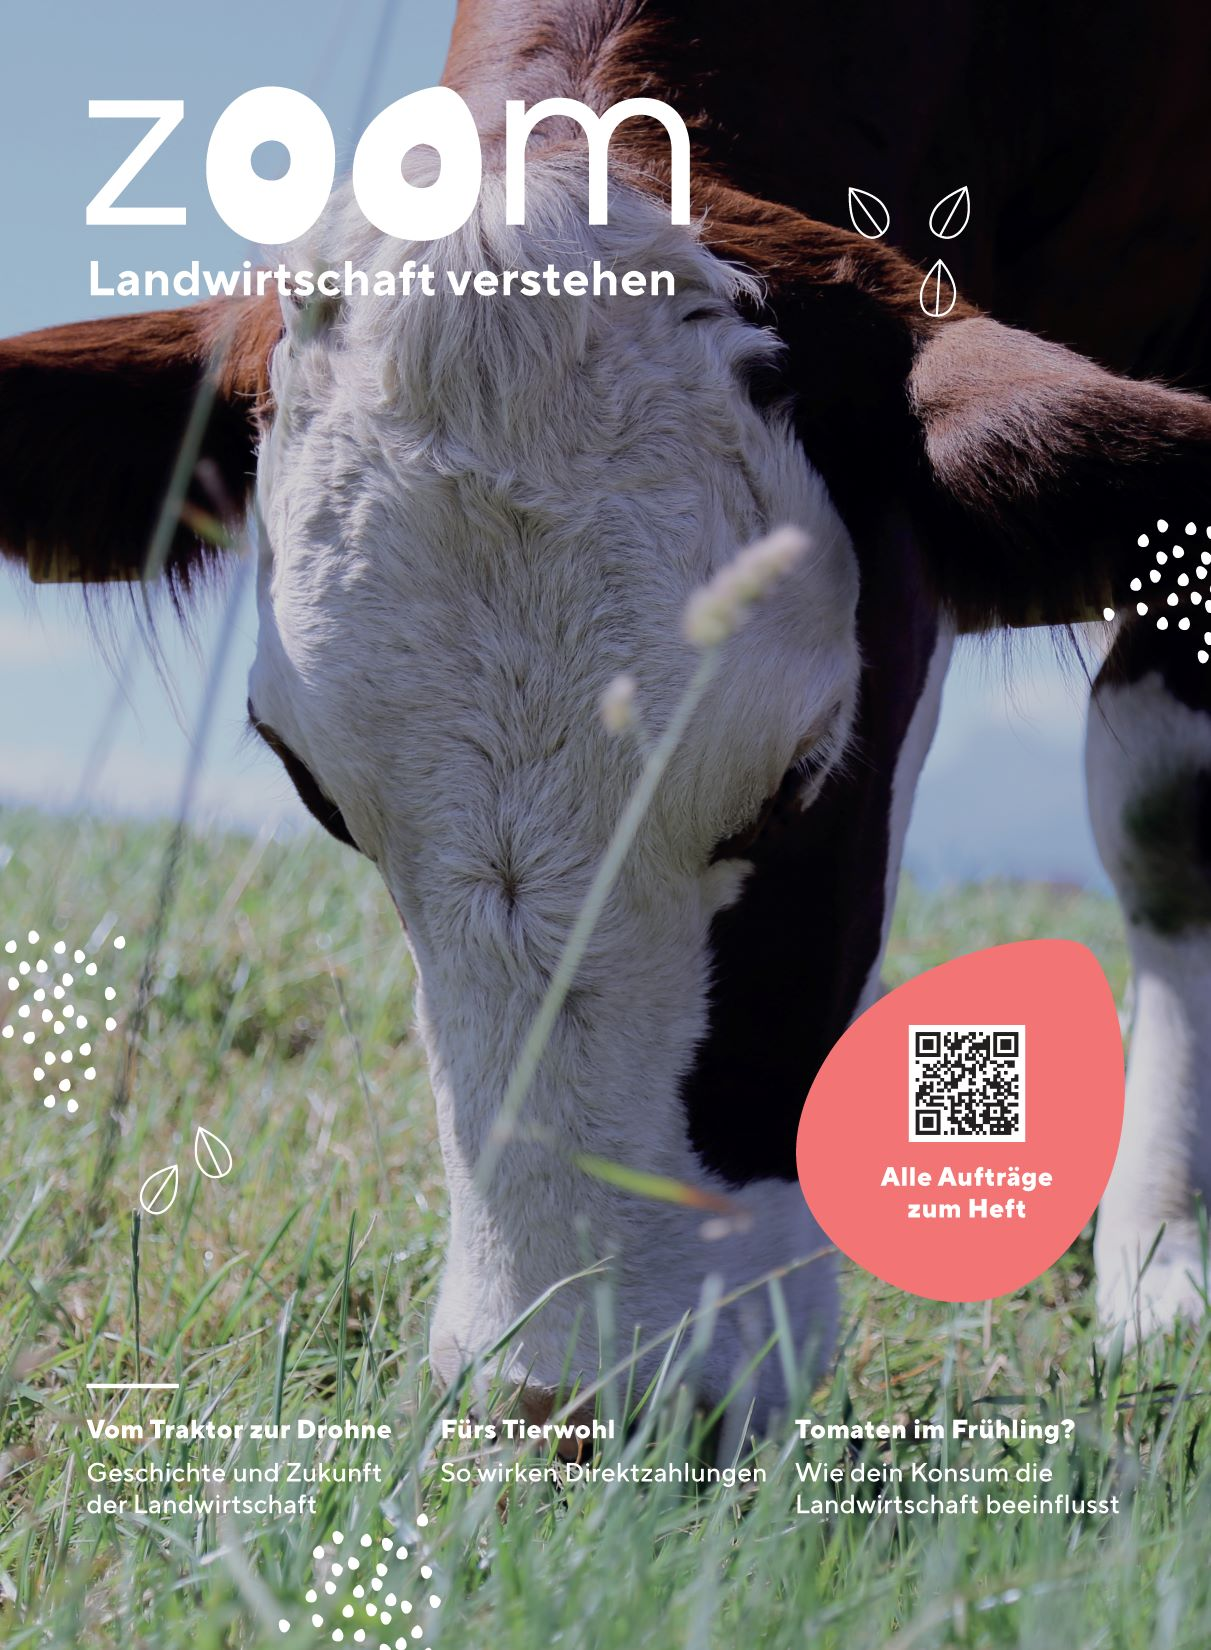 Preview image for LOM object ZOOM - Landwirtschaft verstehen